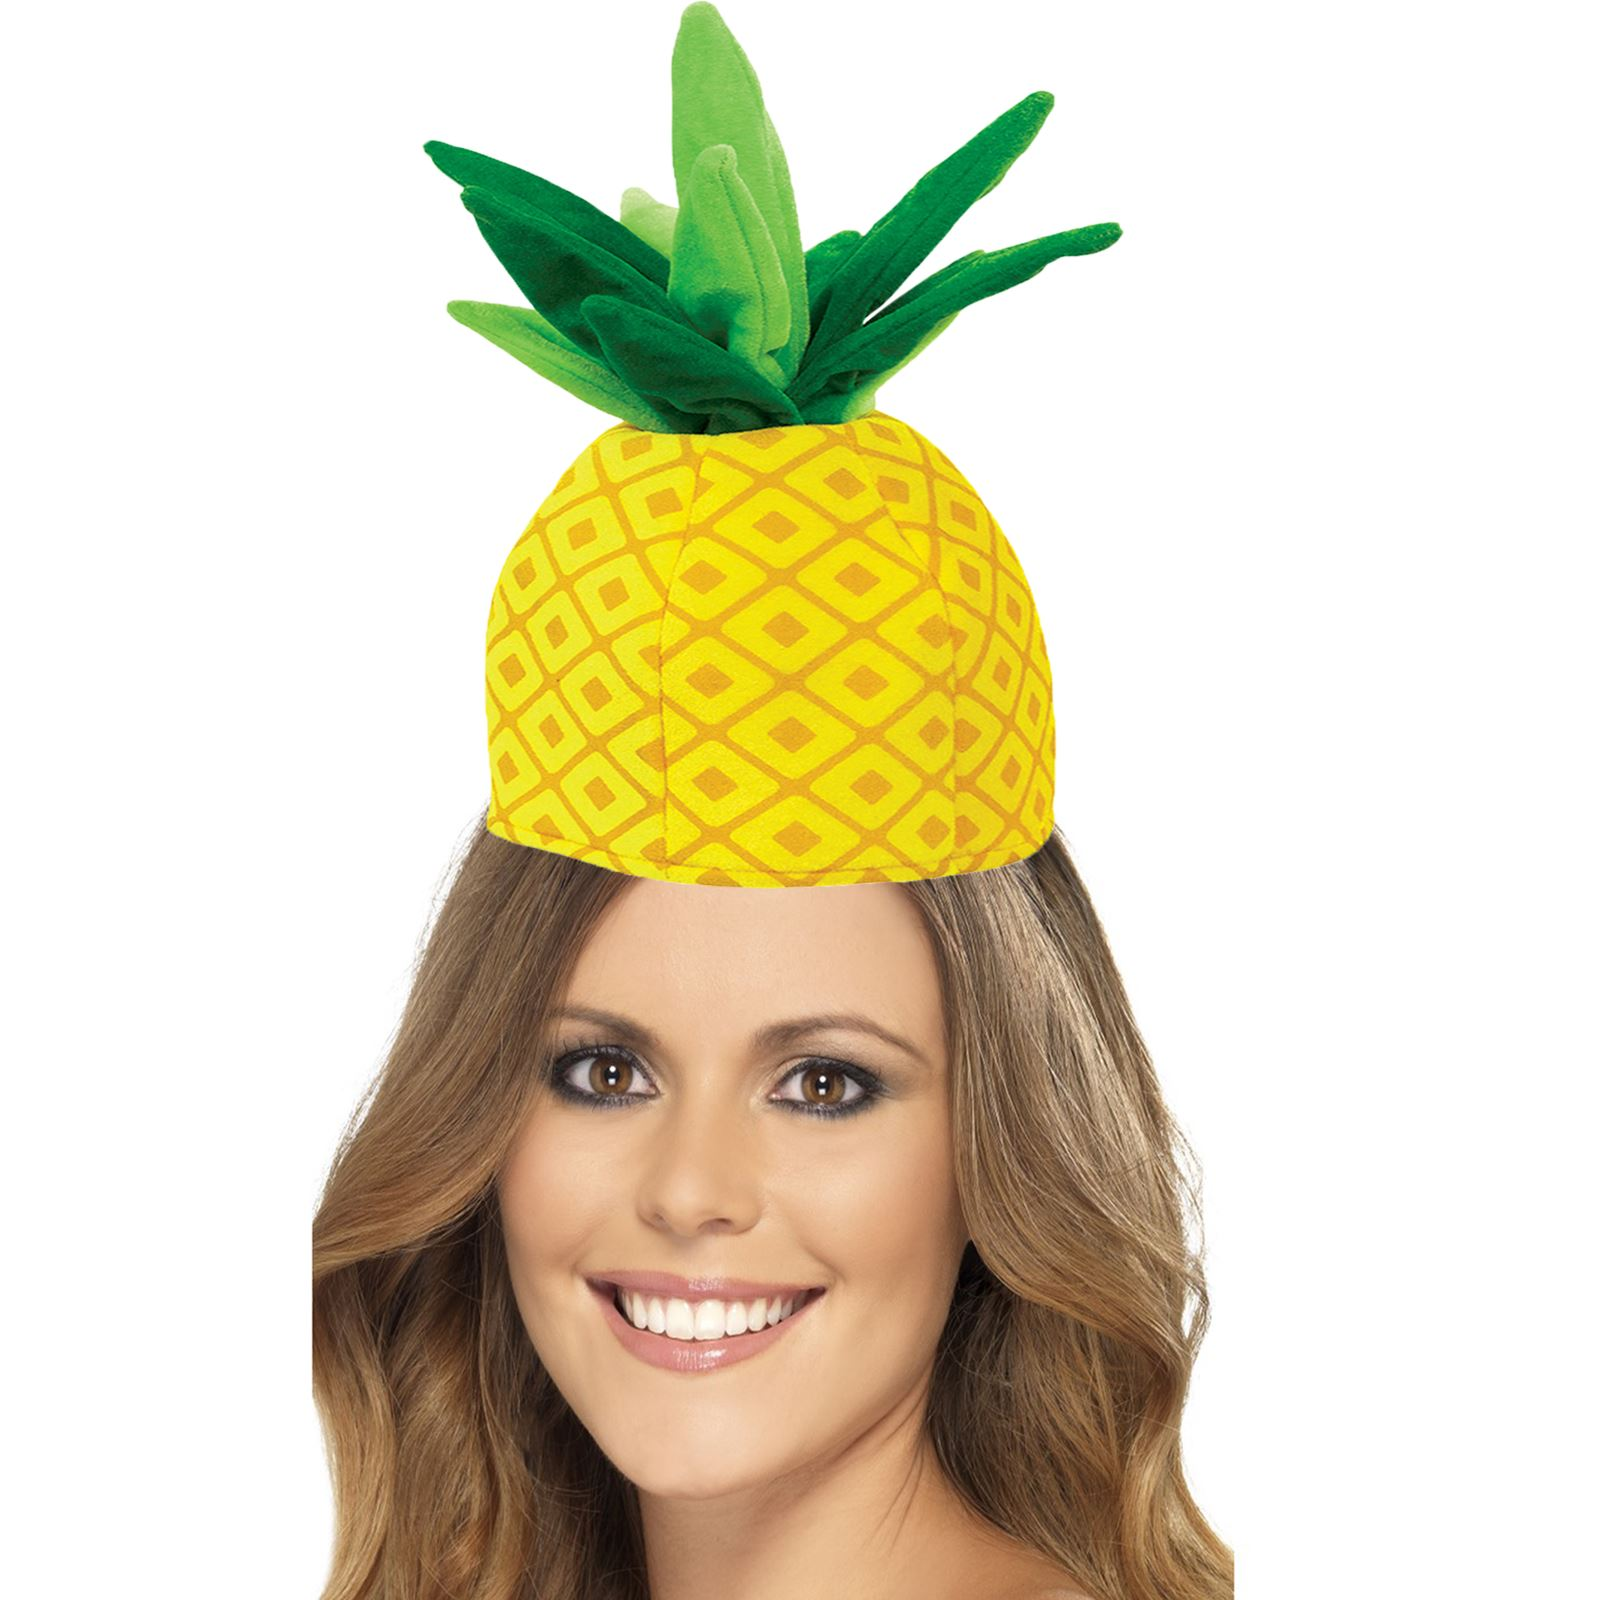 adults novelty tropical fruit pineapple hat summer festival beach party hawaiian 13051812546 ebay. Black Bedroom Furniture Sets. Home Design Ideas